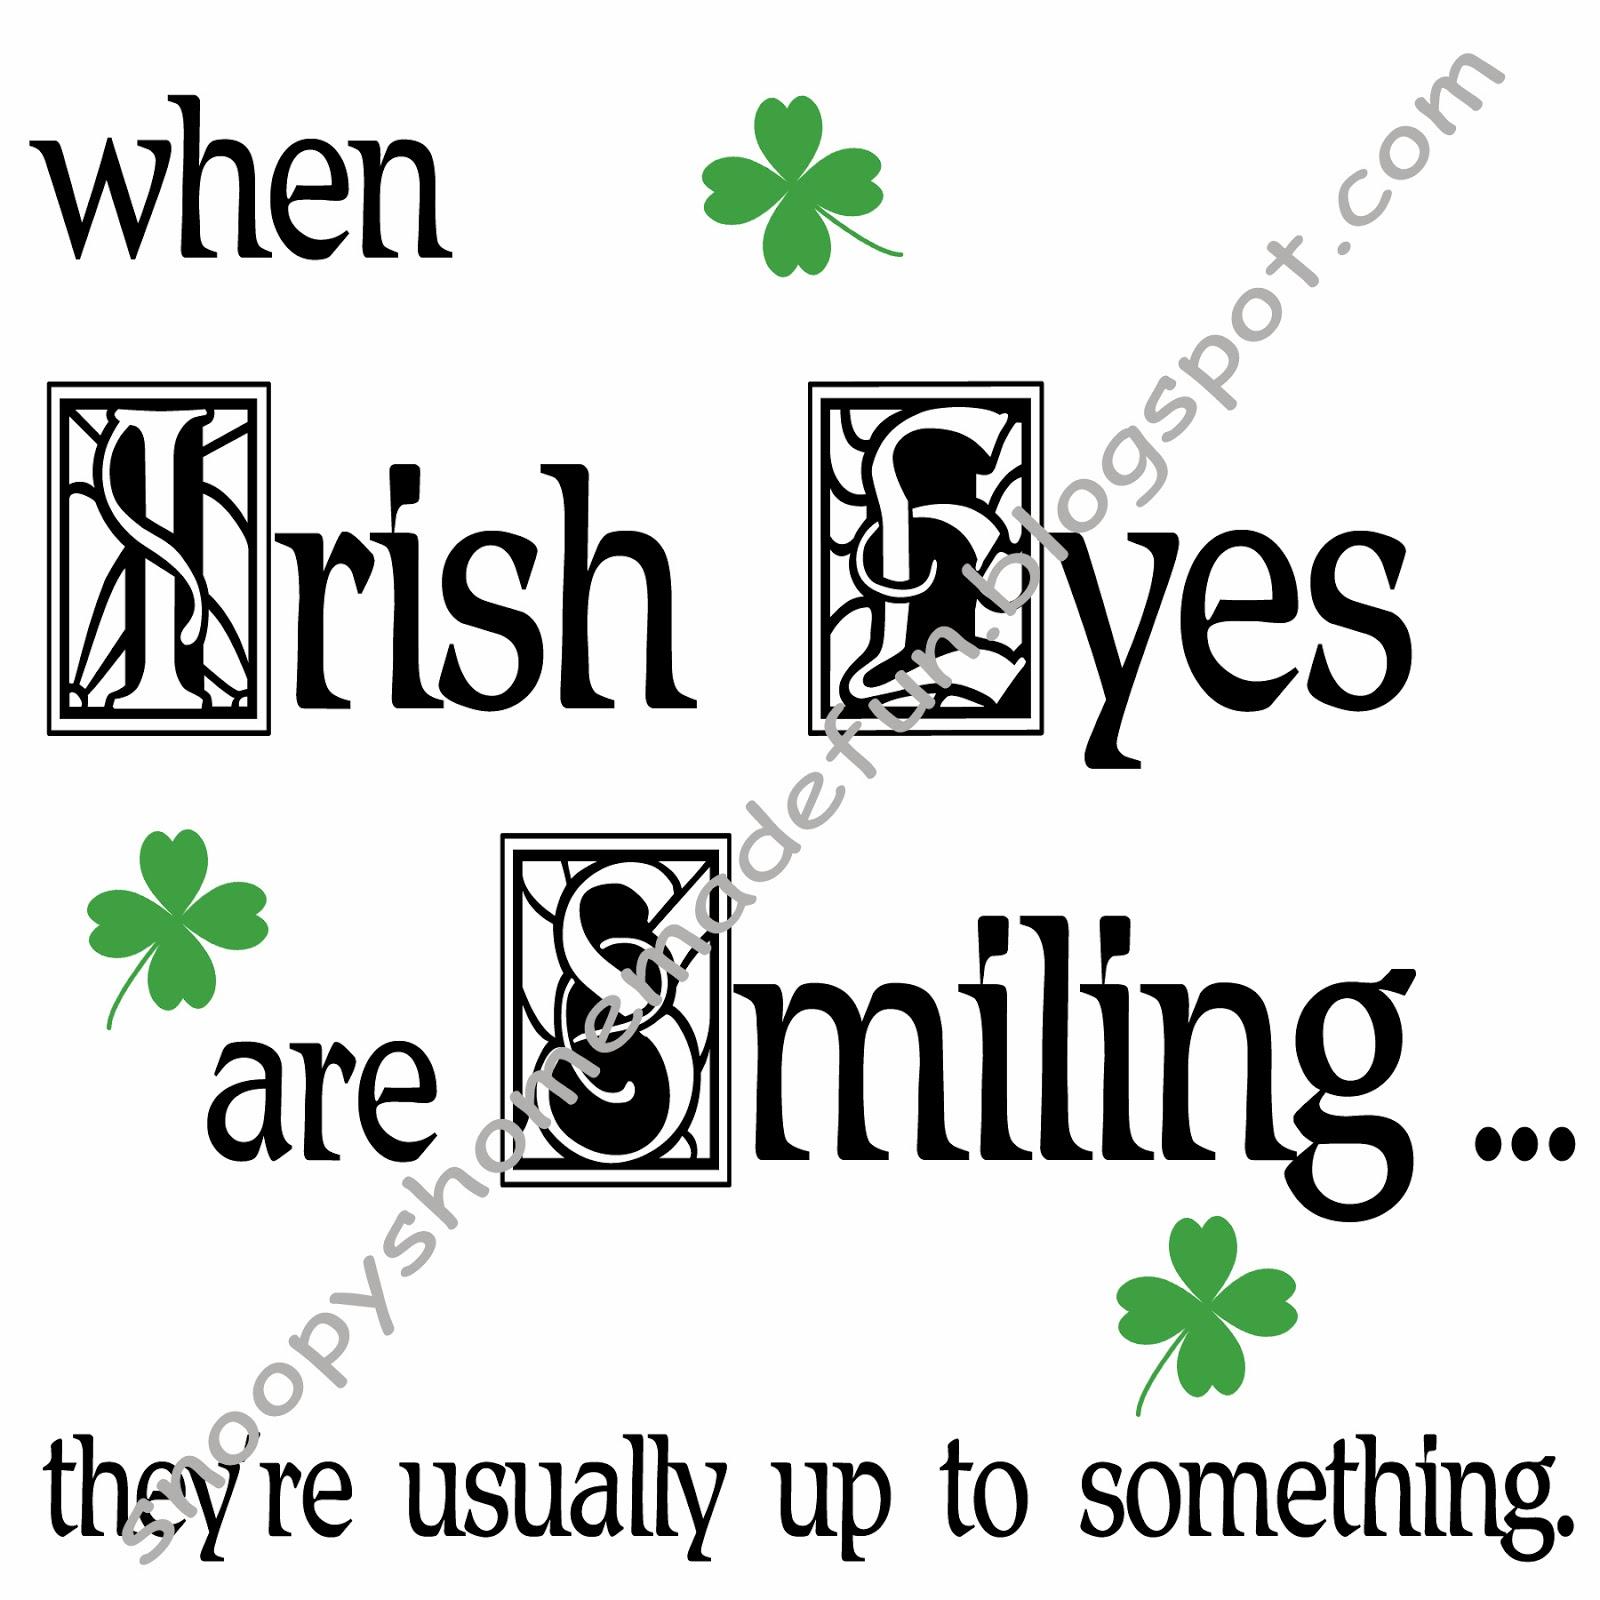 http://3.bp.blogspot.com/-UxDR7sl_wOs/UwhYvr4IniI/AAAAAAAARLk/zxuQ88shZhU/s1600/SHF+Irish+Eyes+watermarked.jpg